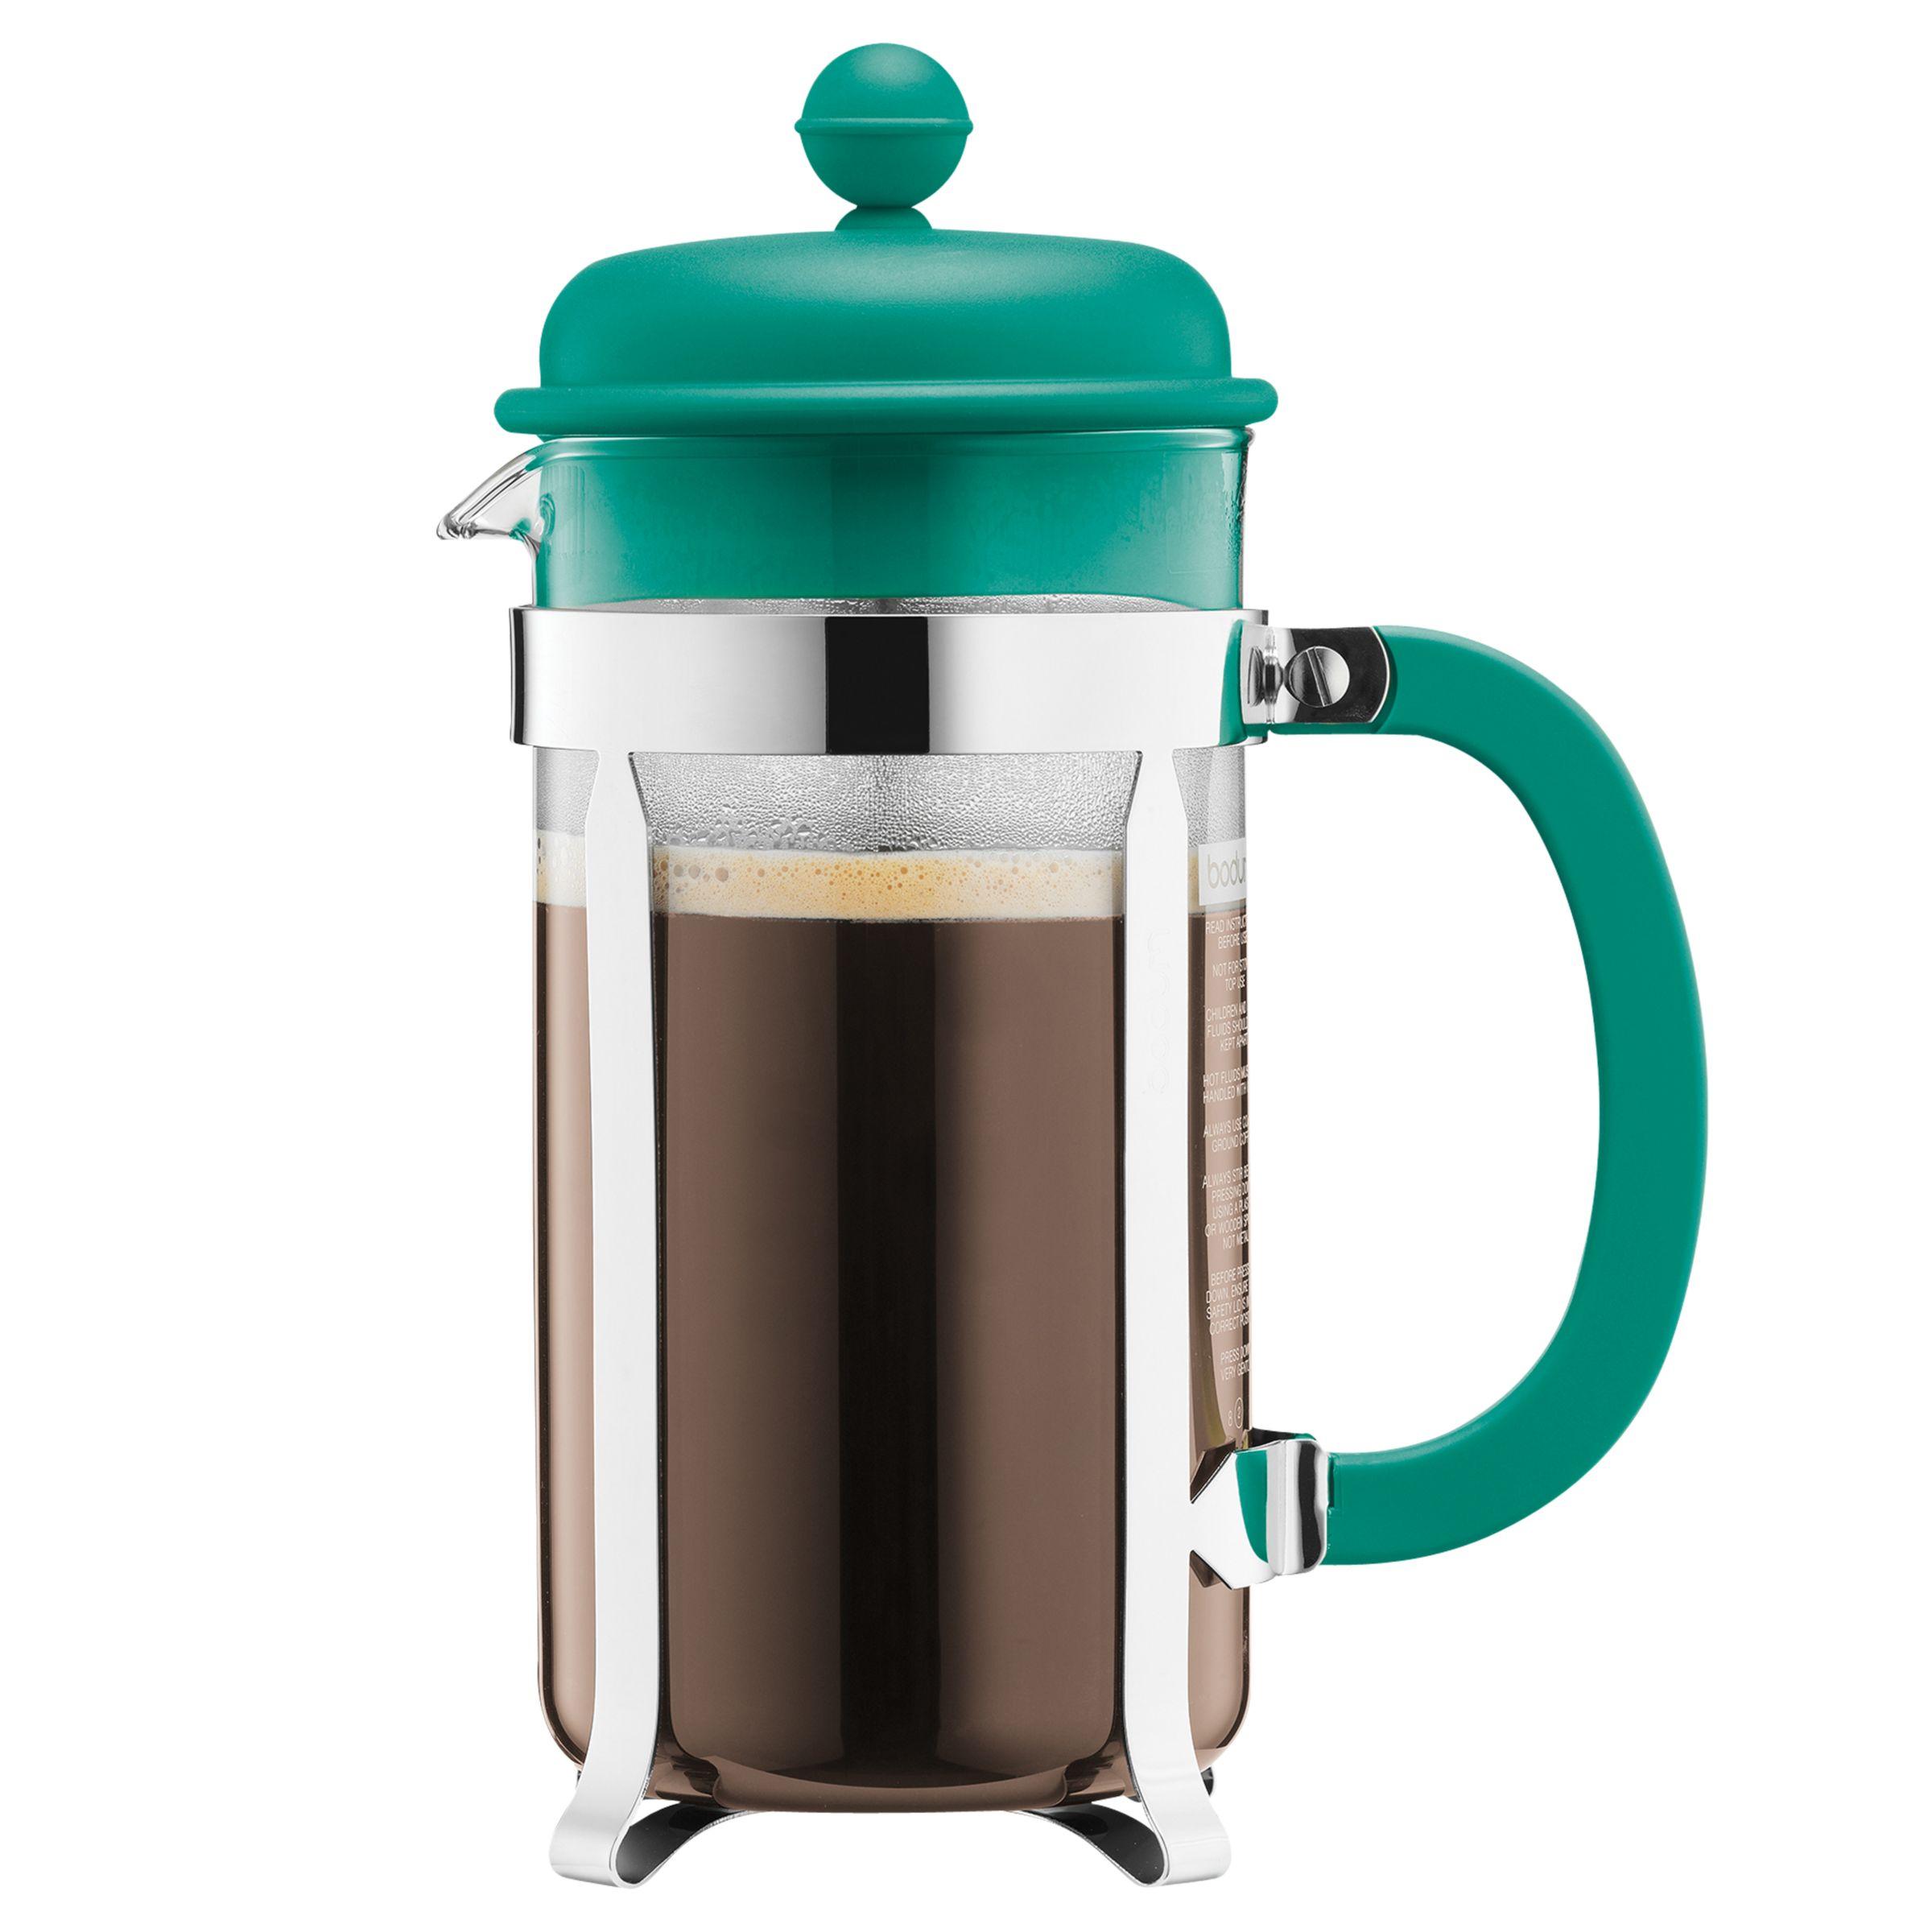 Bodum Bodum Caffettiera, 8 Cup, 1L